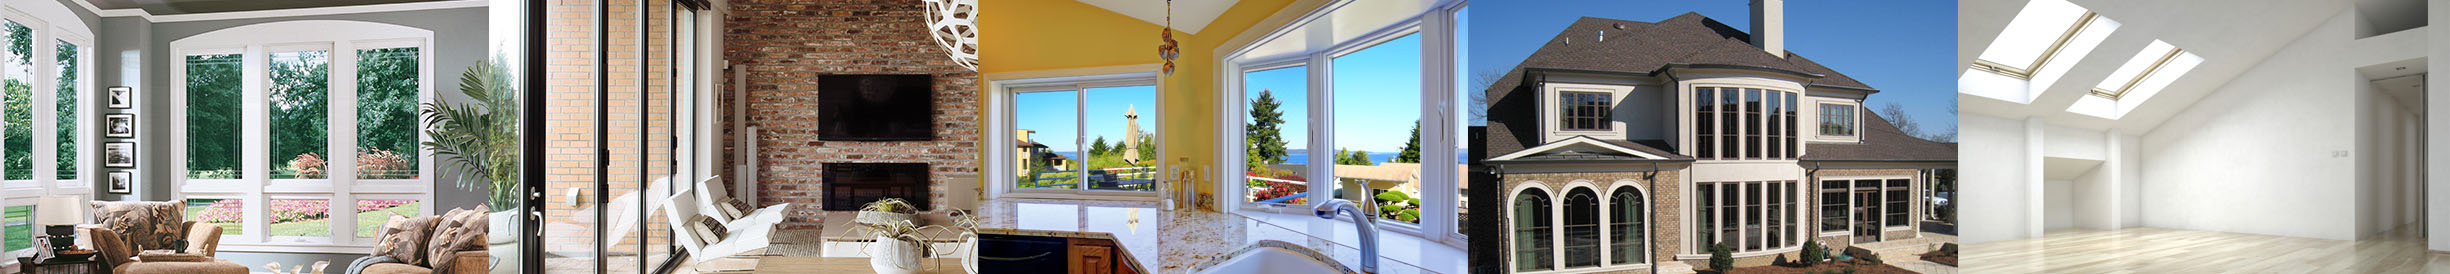 north glass window installations ben lomond california